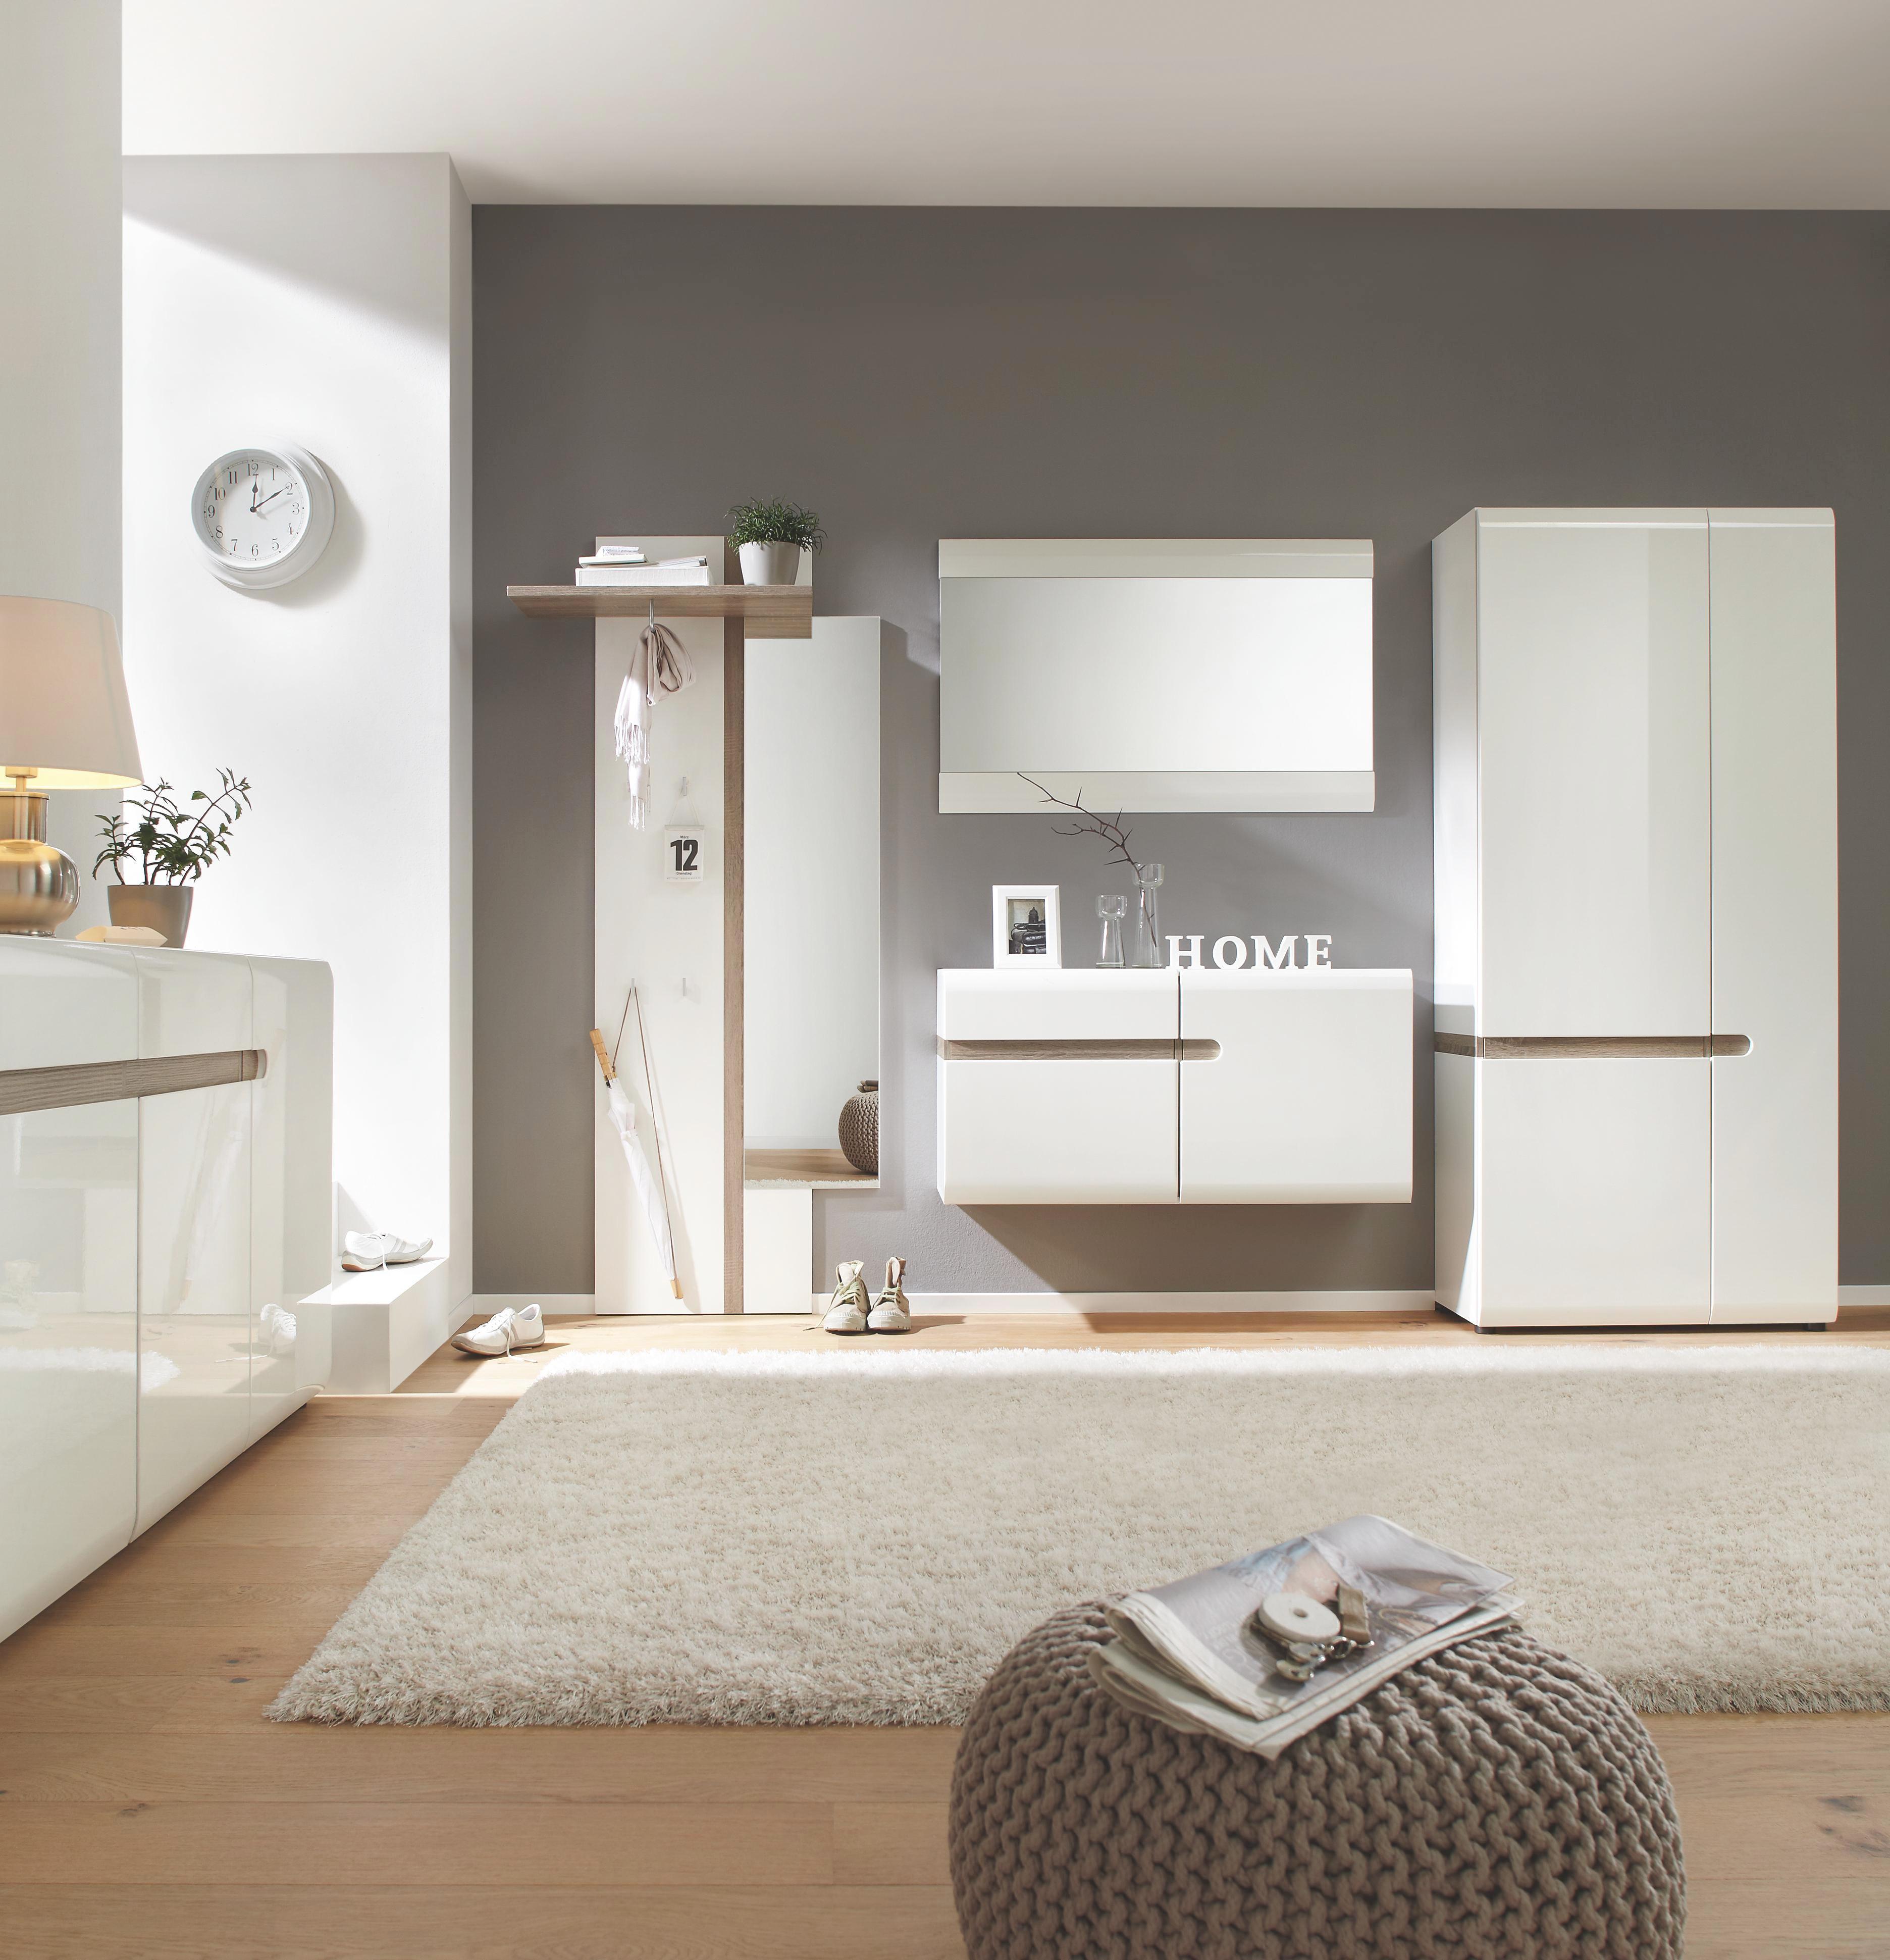 ber hmt designer garderobenschr nke ideen die besten. Black Bedroom Furniture Sets. Home Design Ideas